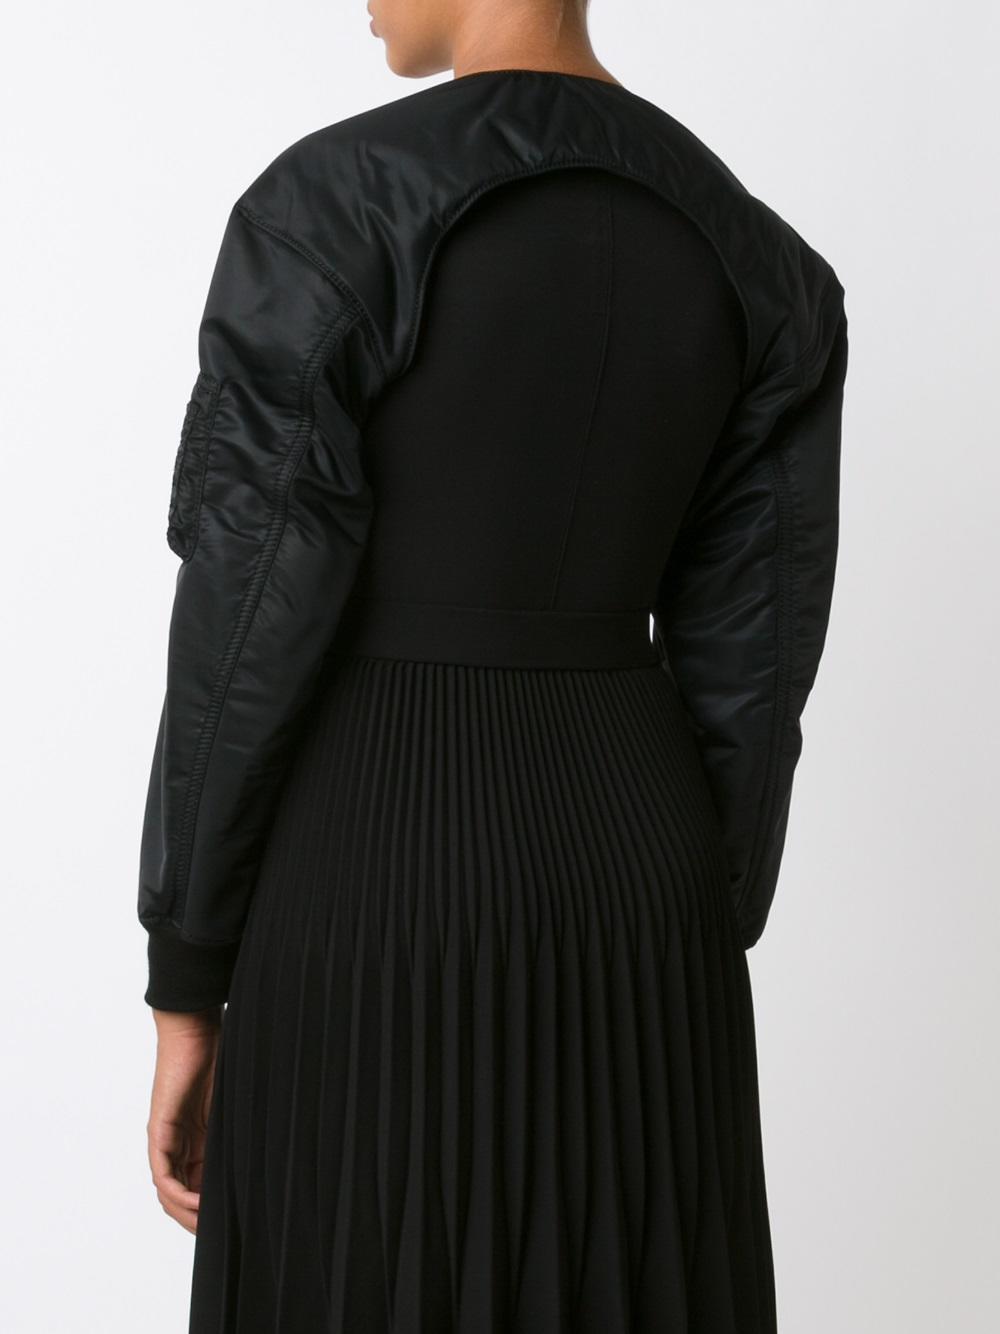 Comme des Garçons Comme Des Garçons Noir Kei Ninomiya Bomber-style Sleeves in Black